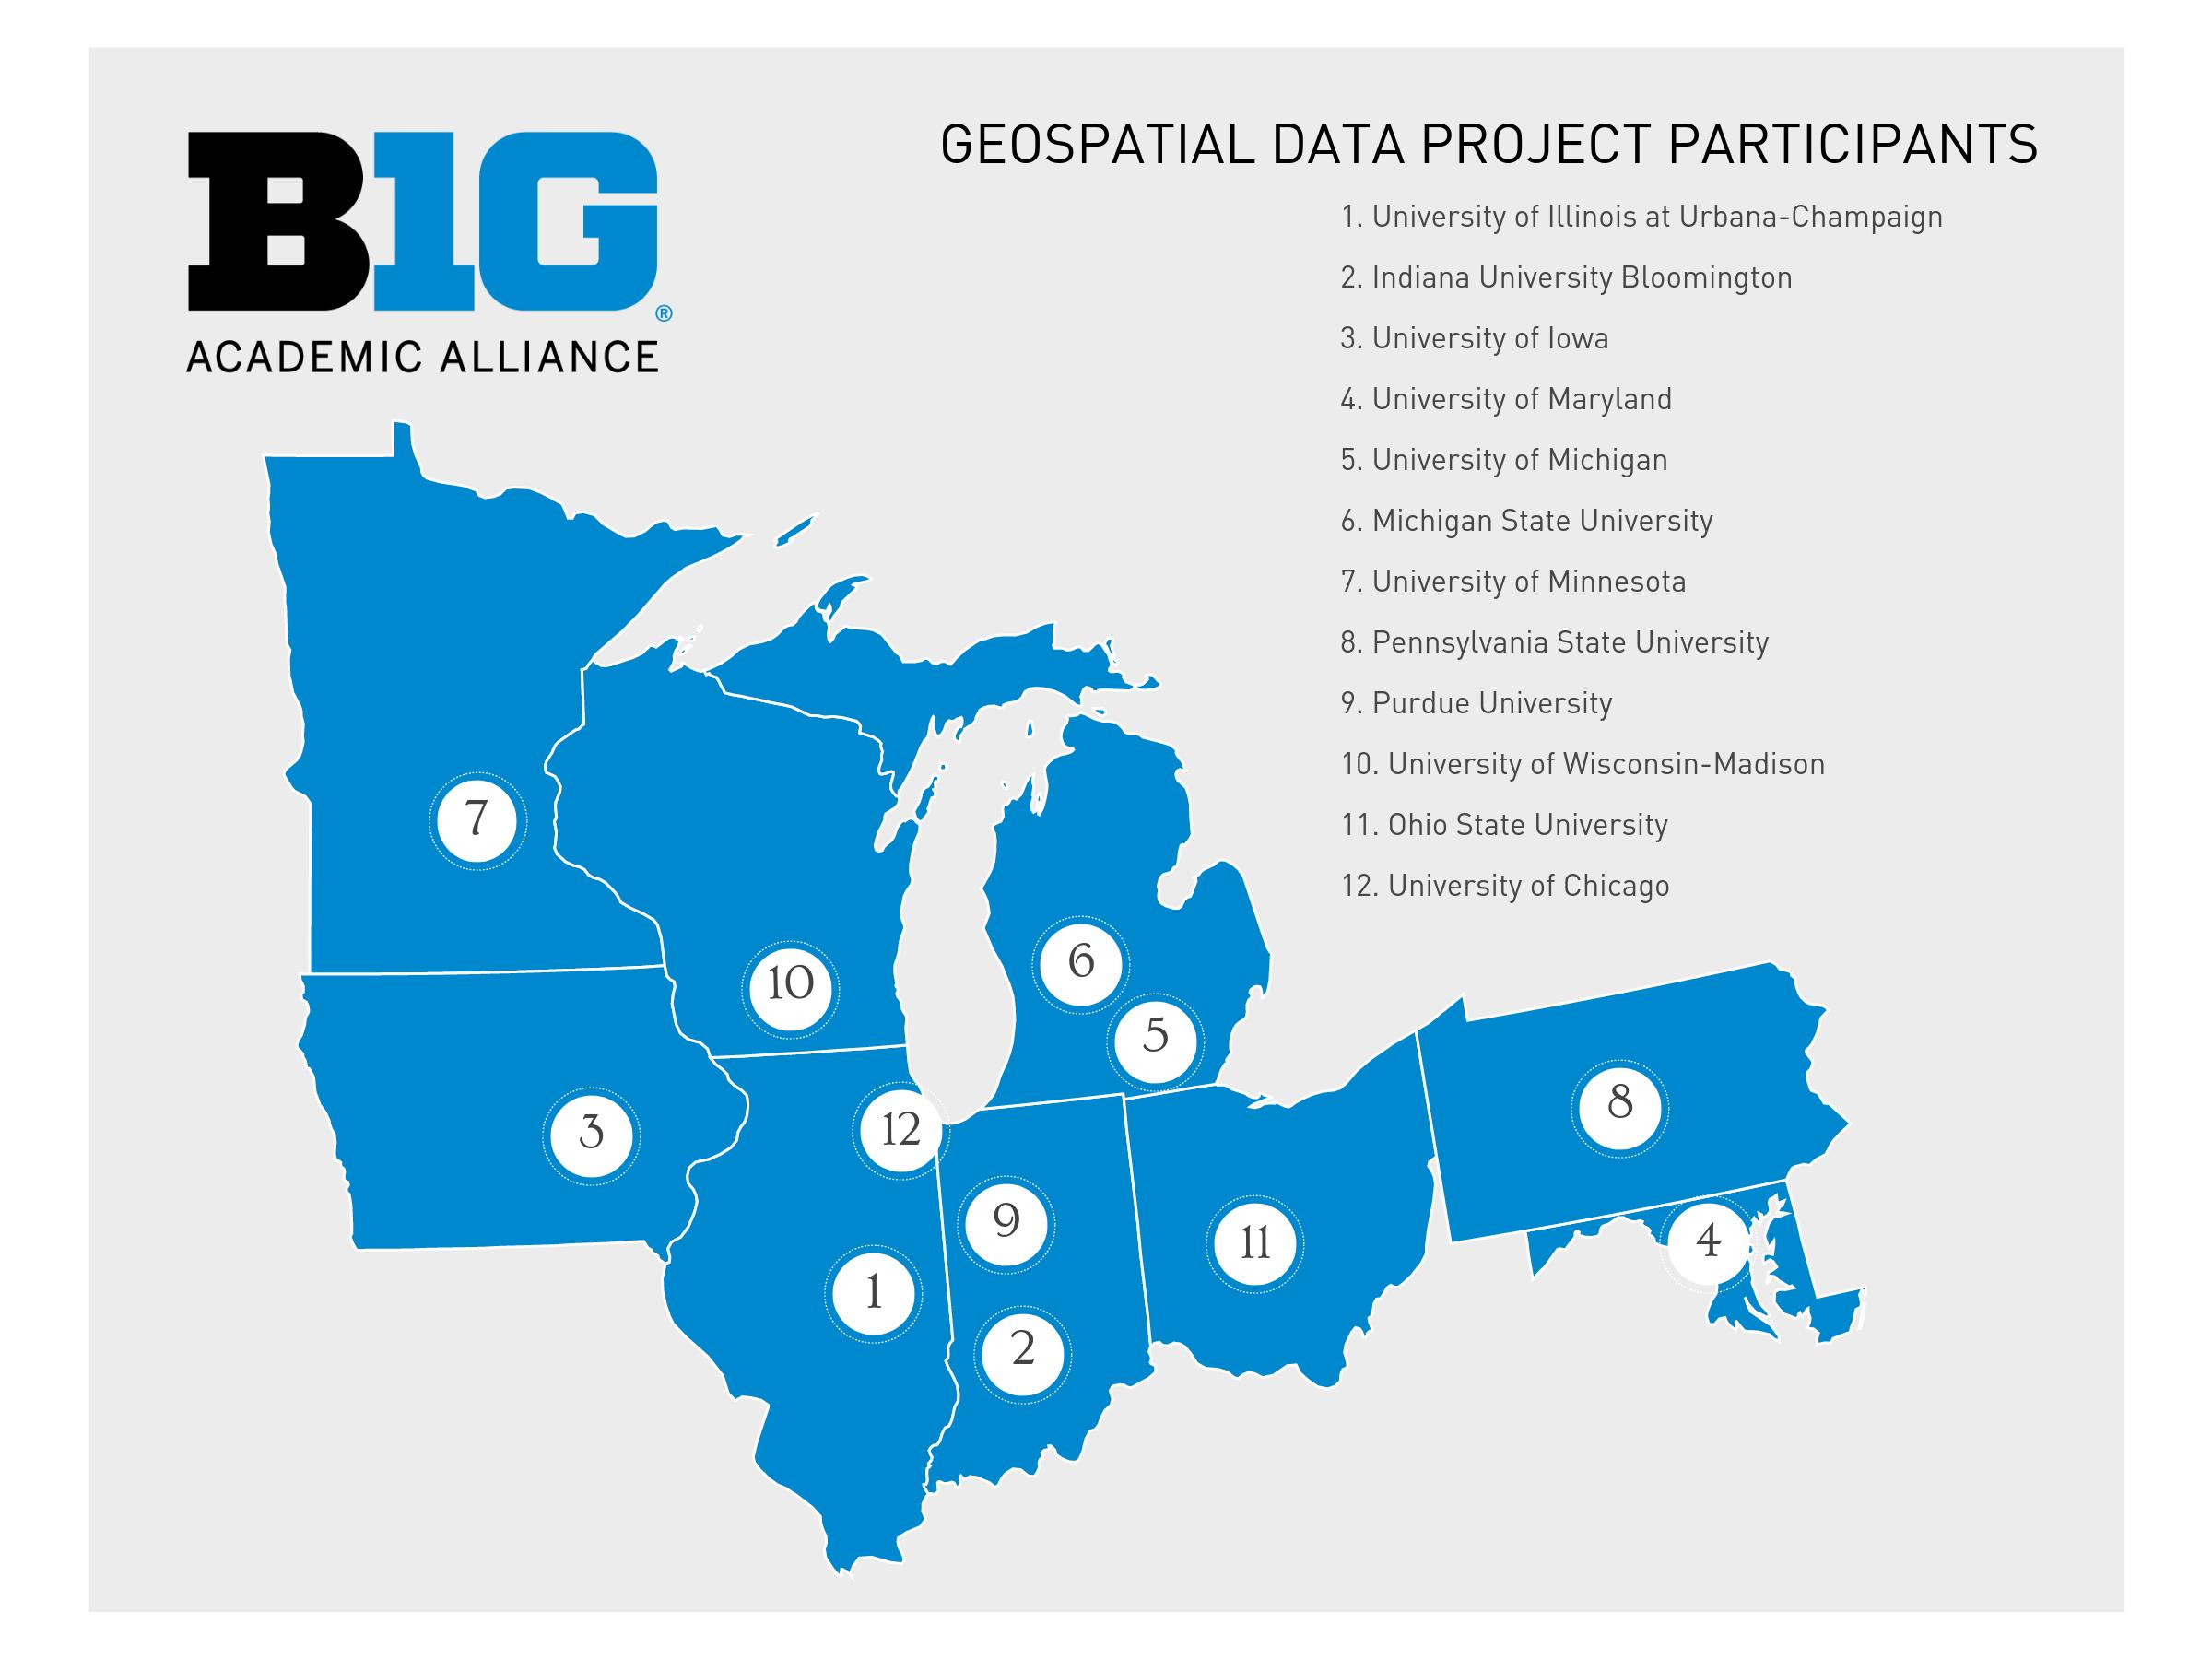 btaagdp-participantmap